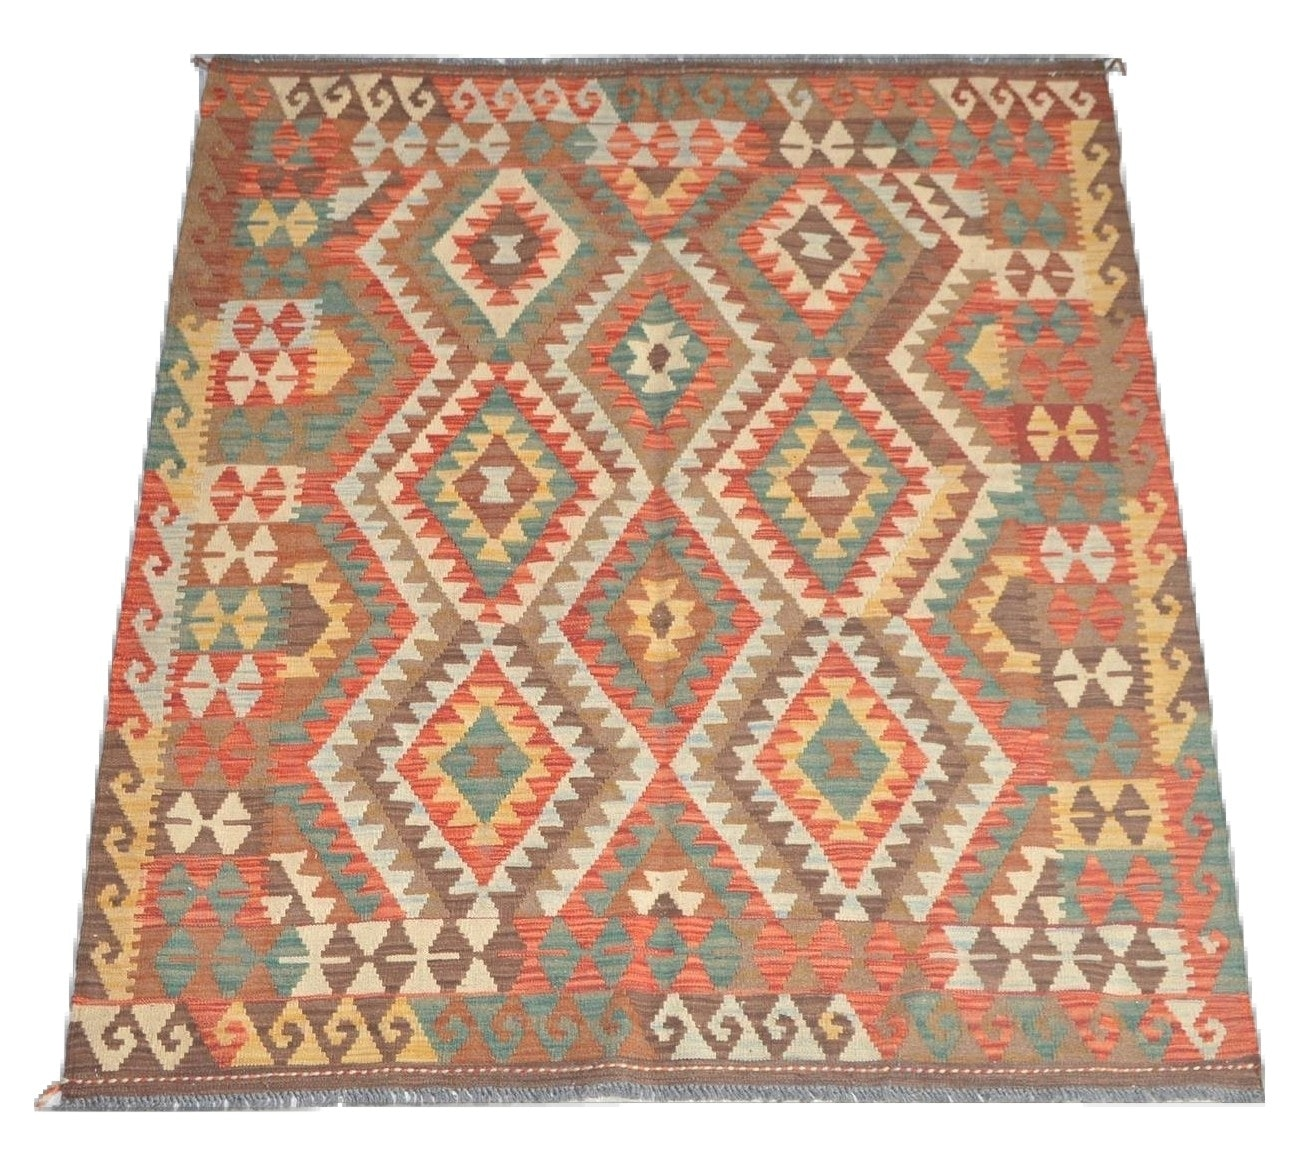 Handwoven Kilim Wool Area Rug